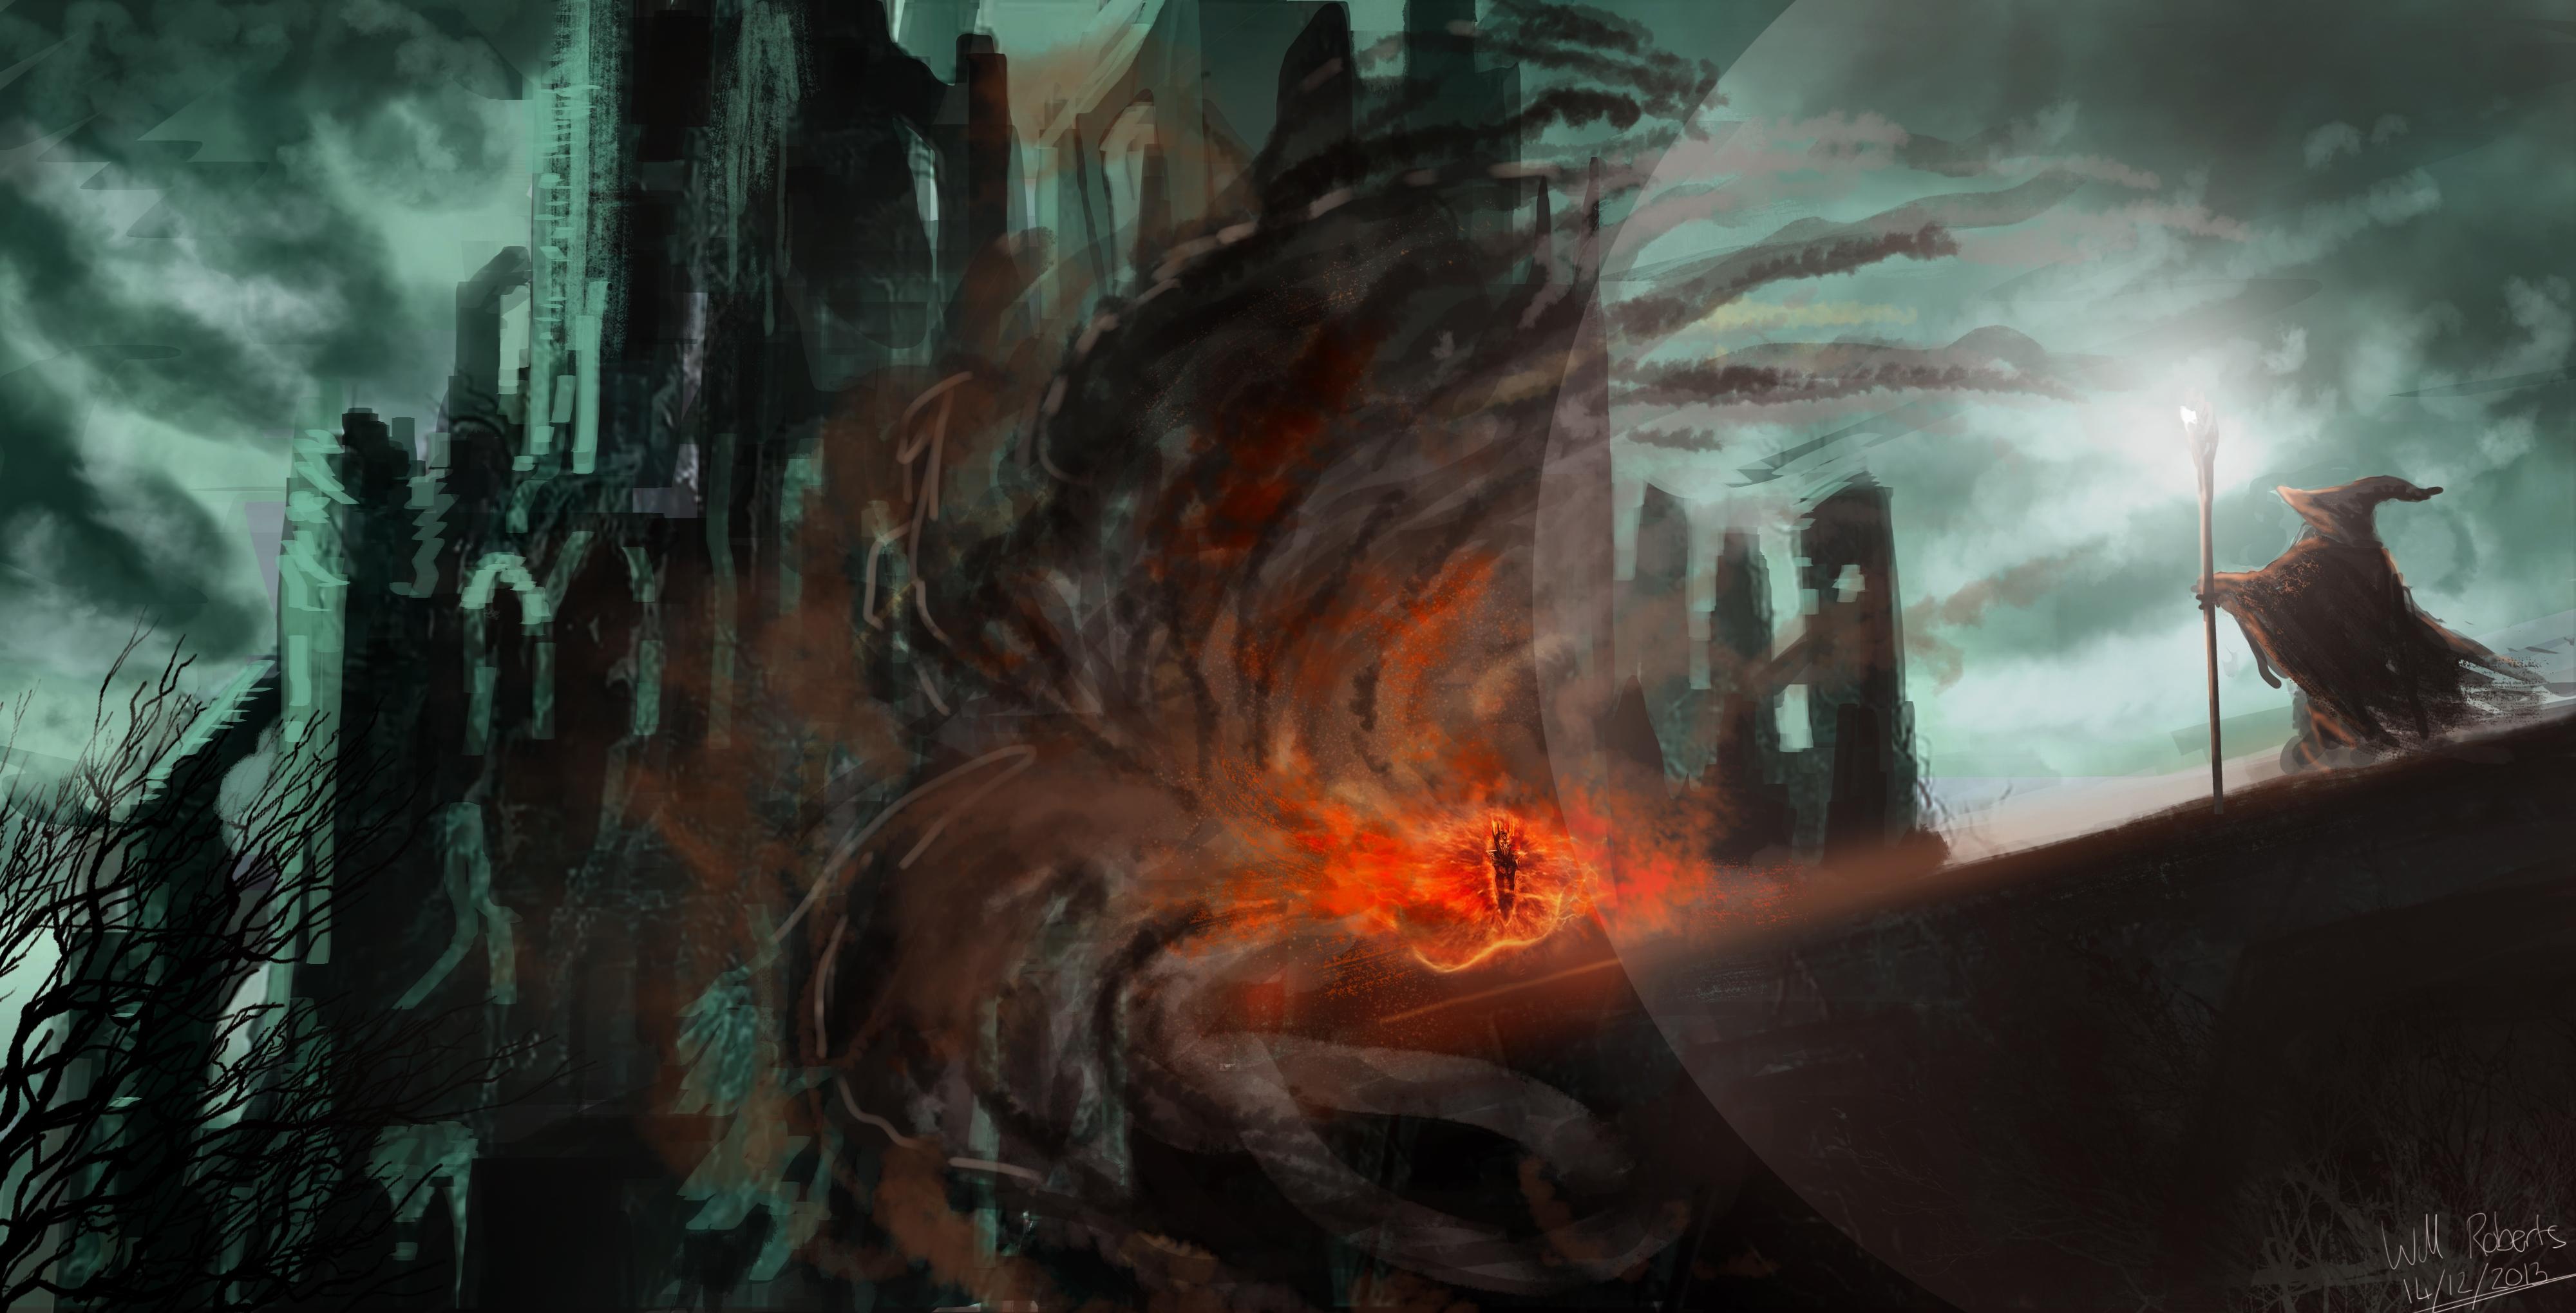 The Hobbit Fan Art By Willroberts04 On Deviantart